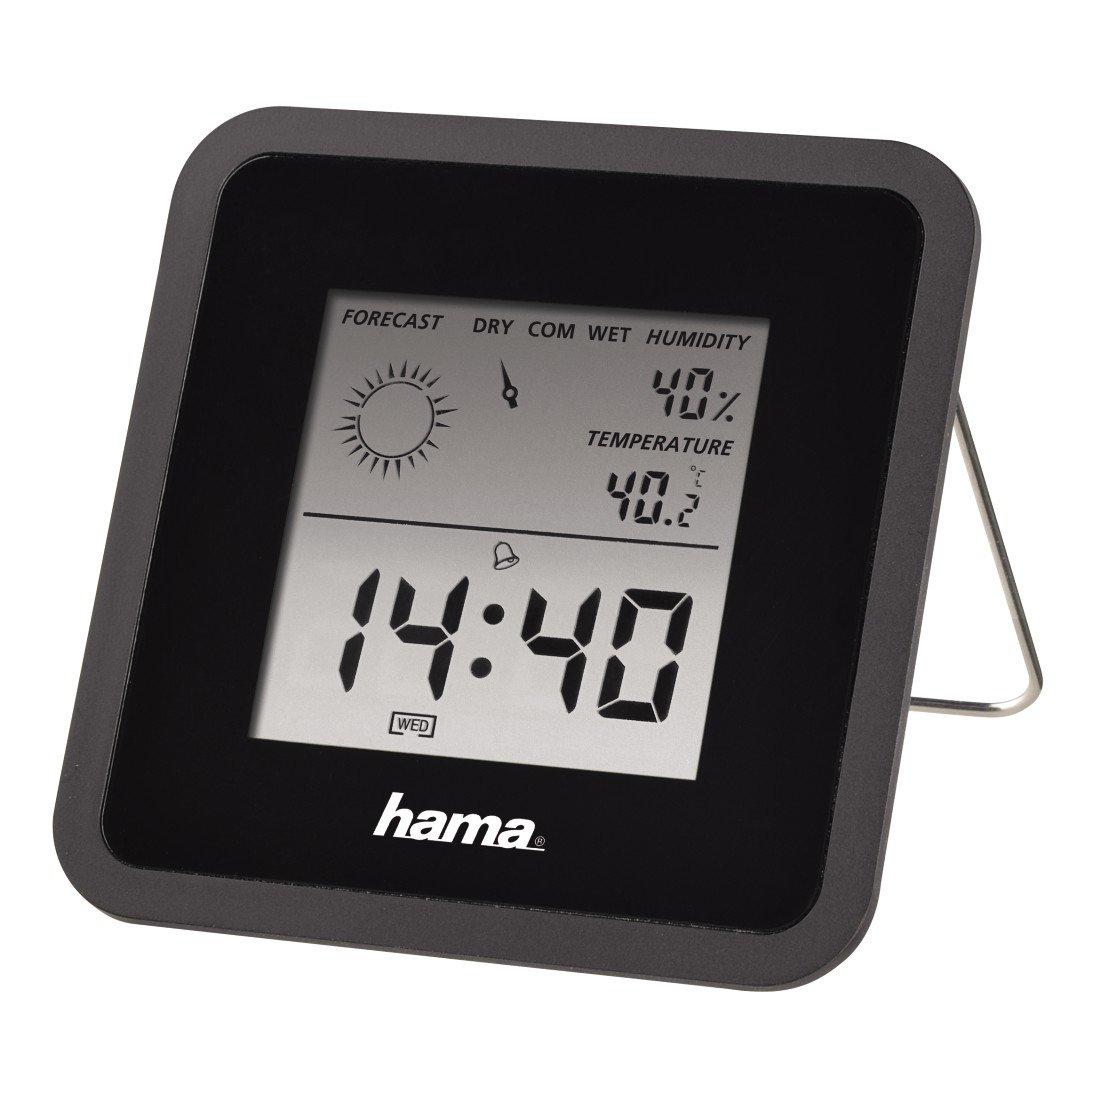 Hama Thermo/ Hygrometer, Black